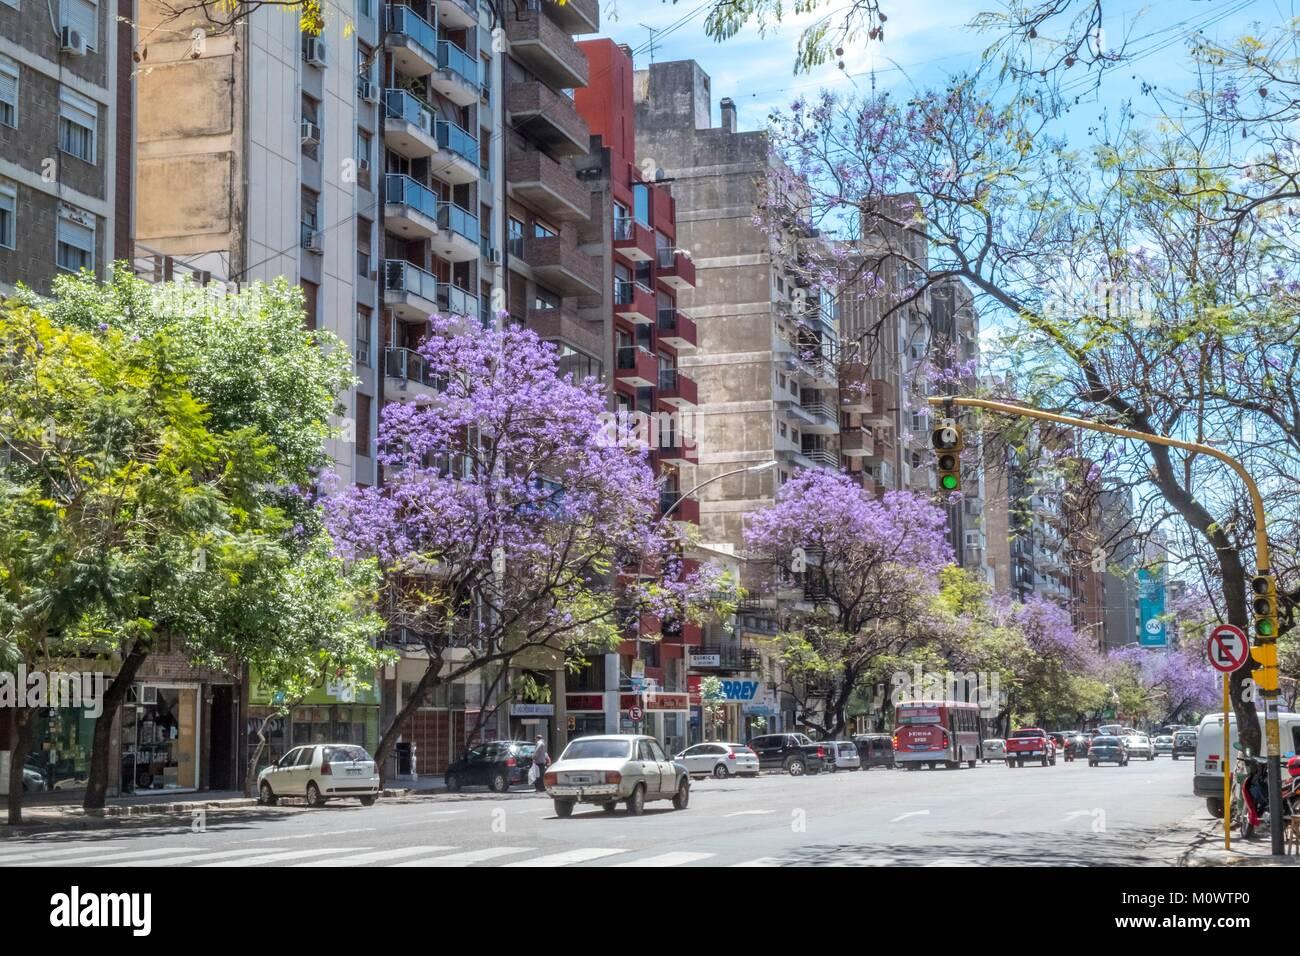 Argentina,Cordoba province,Cordoba,Chacabuco avenue - Stock Image